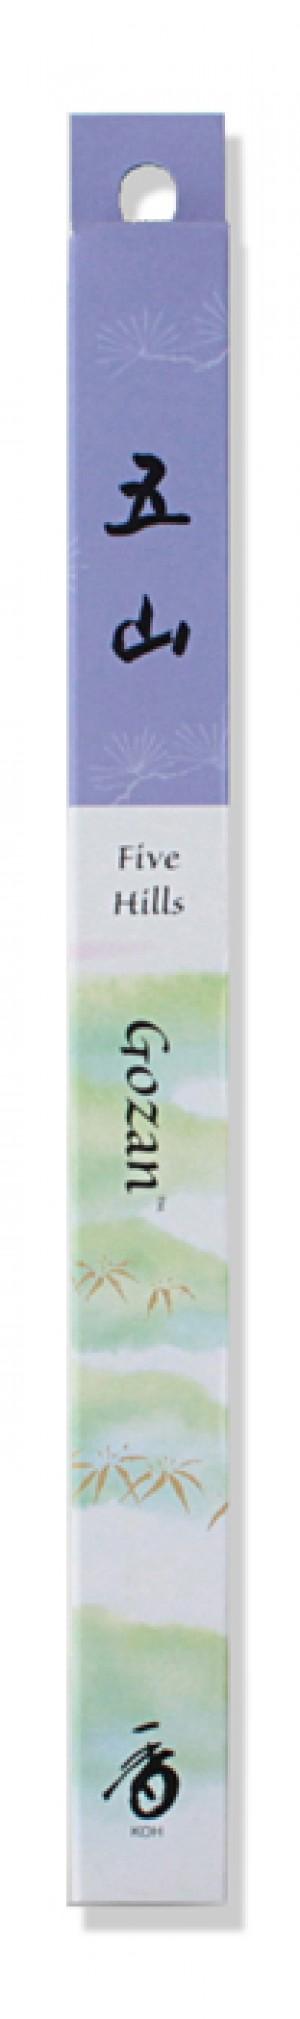 Shoyeido - Go-zan / Five Hills - 35 Incense Sticks